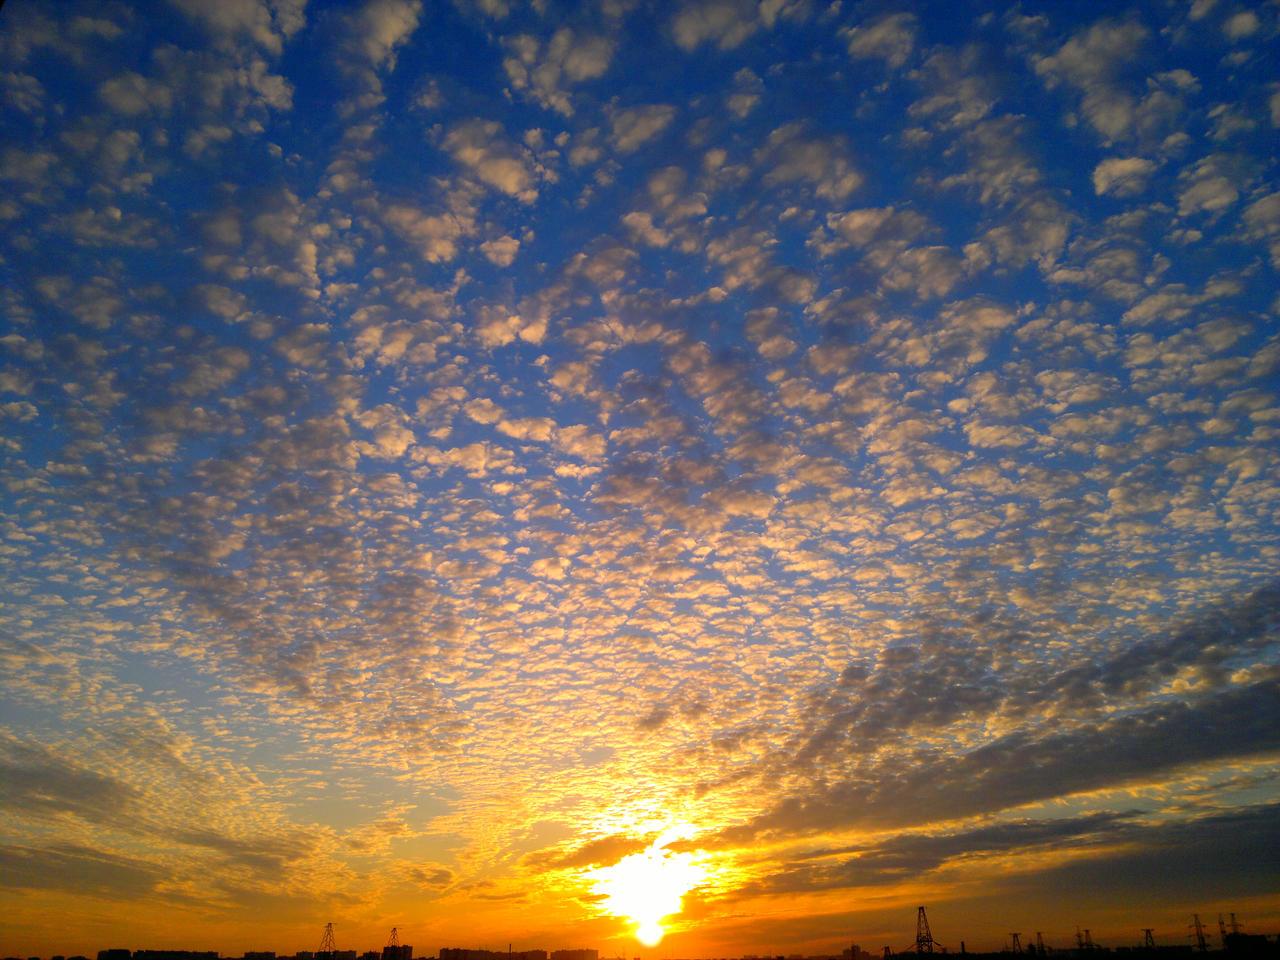 Morning sunrise by wishbat on deviantart for Morning sunrise images